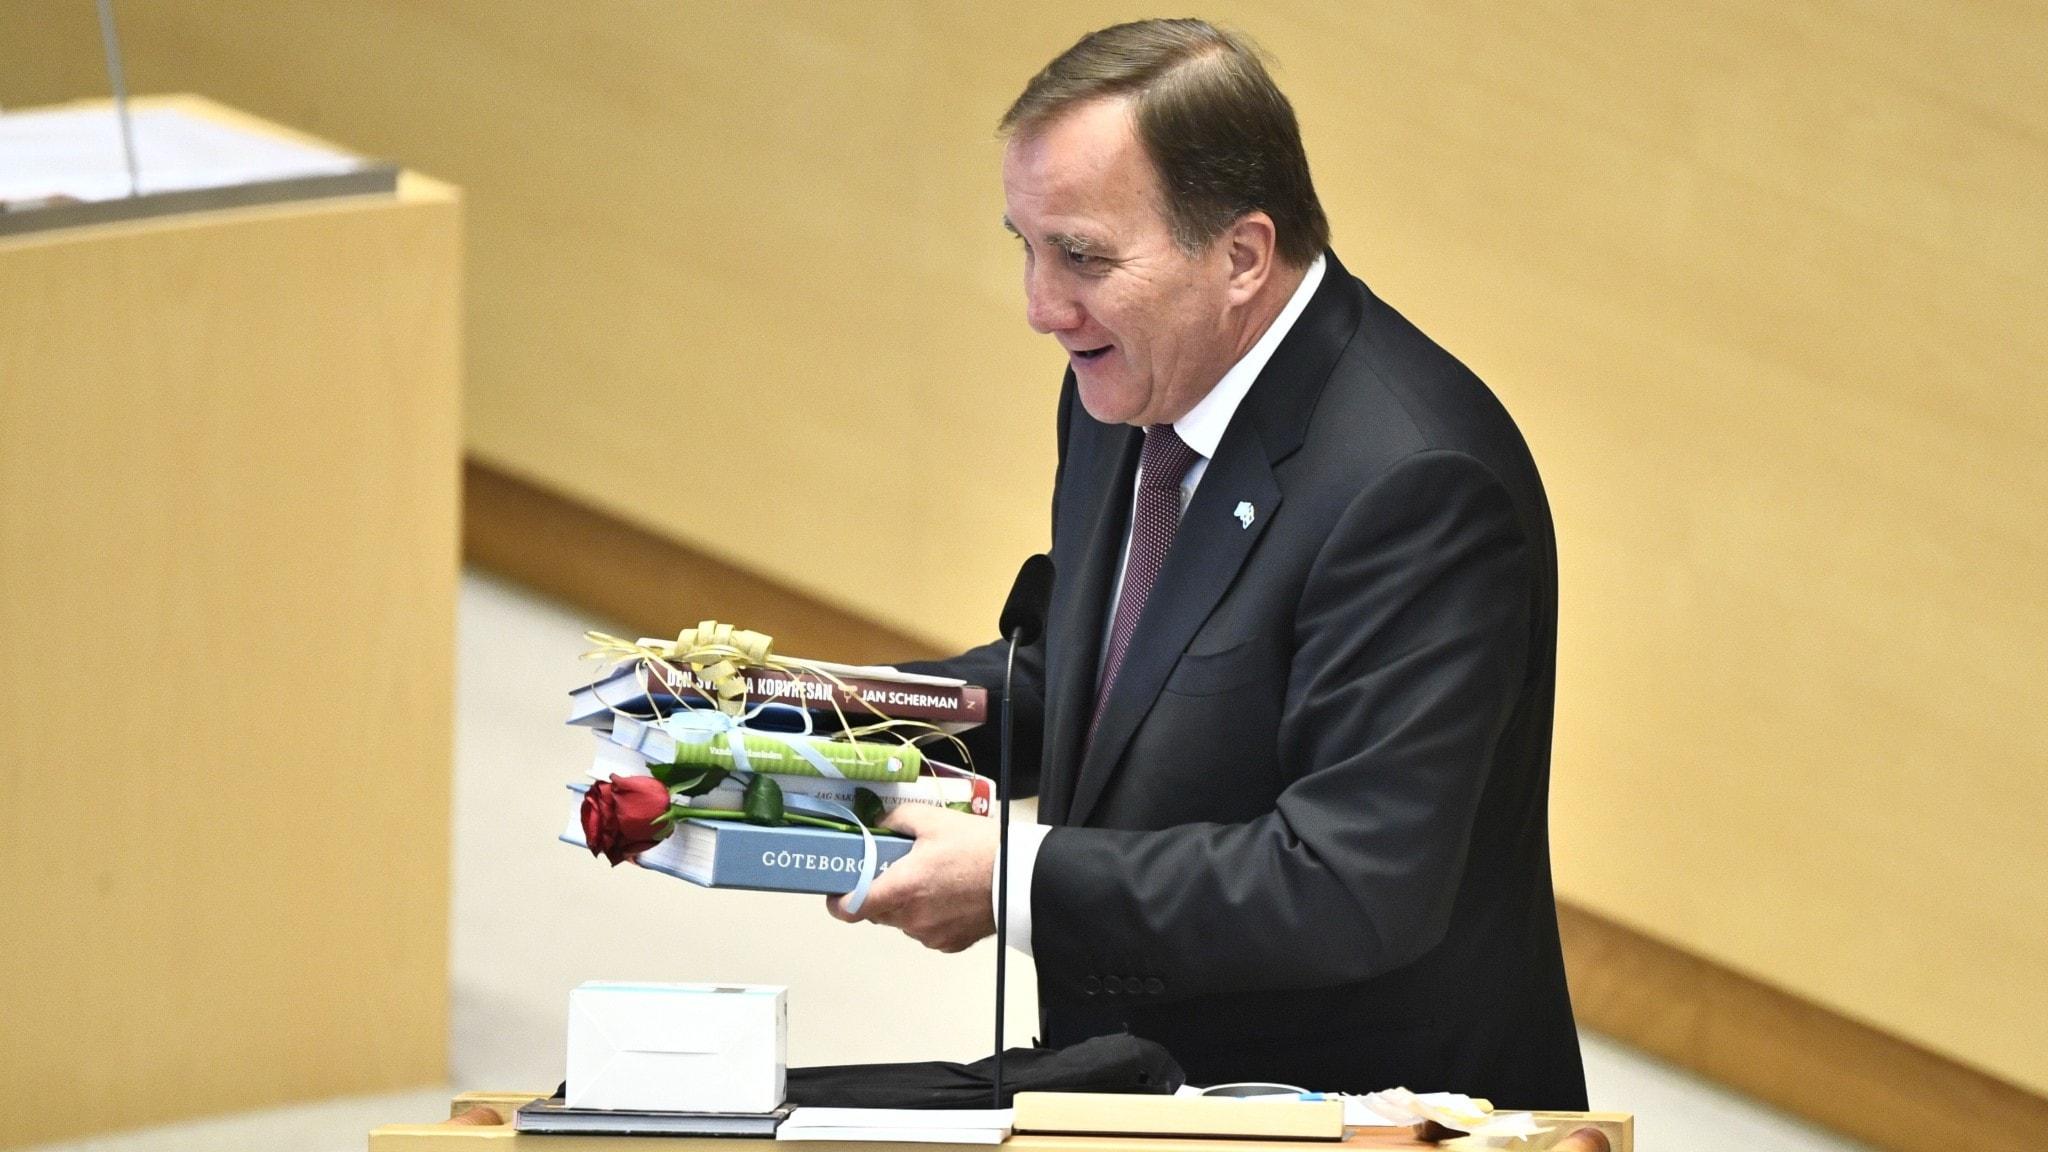 Stefan Löfven carrying gifts.